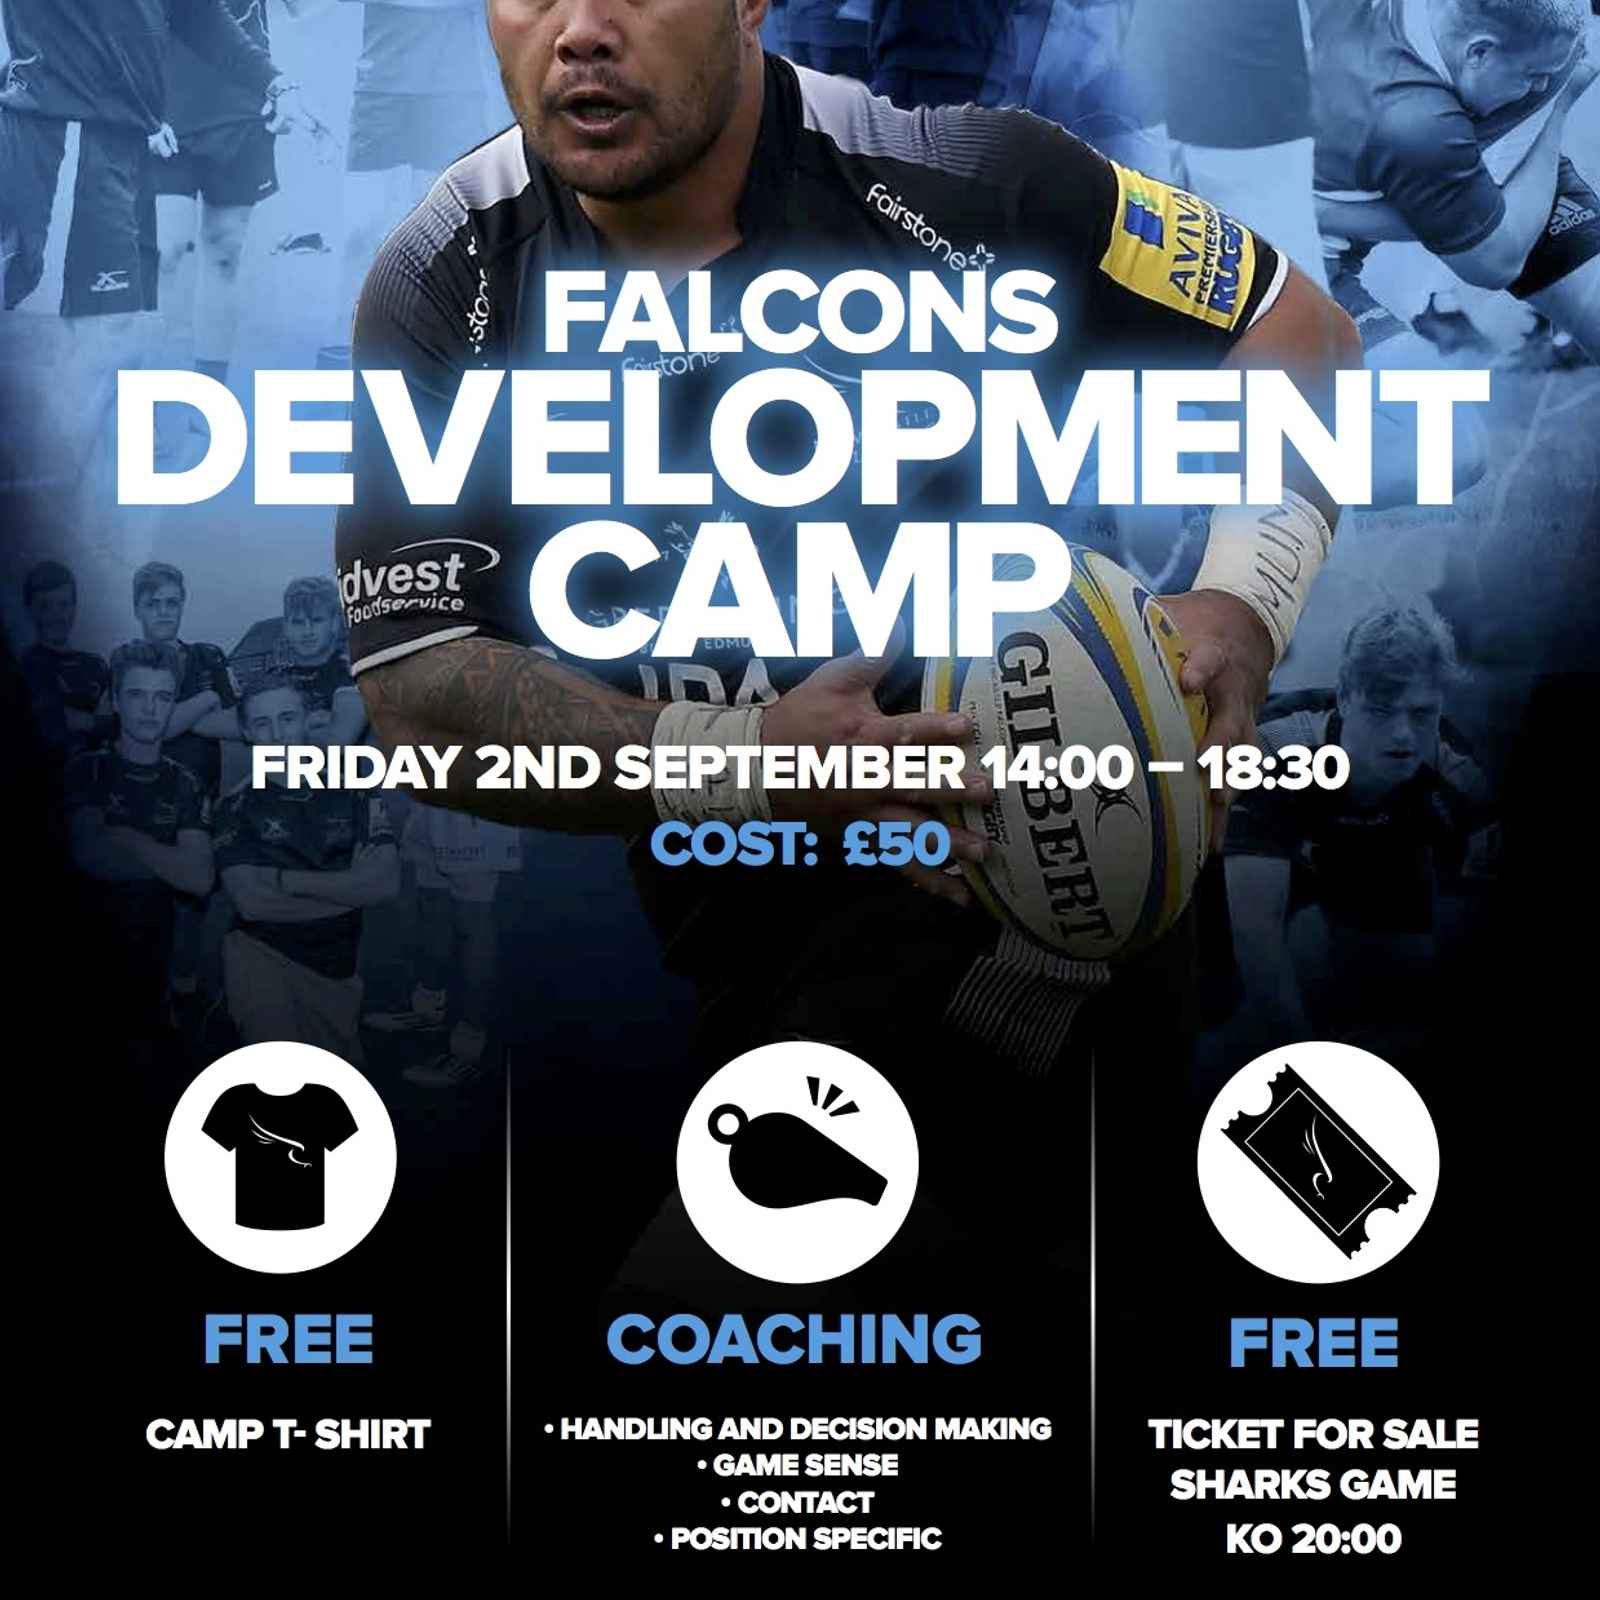 U13-16 Falcons Development Camp